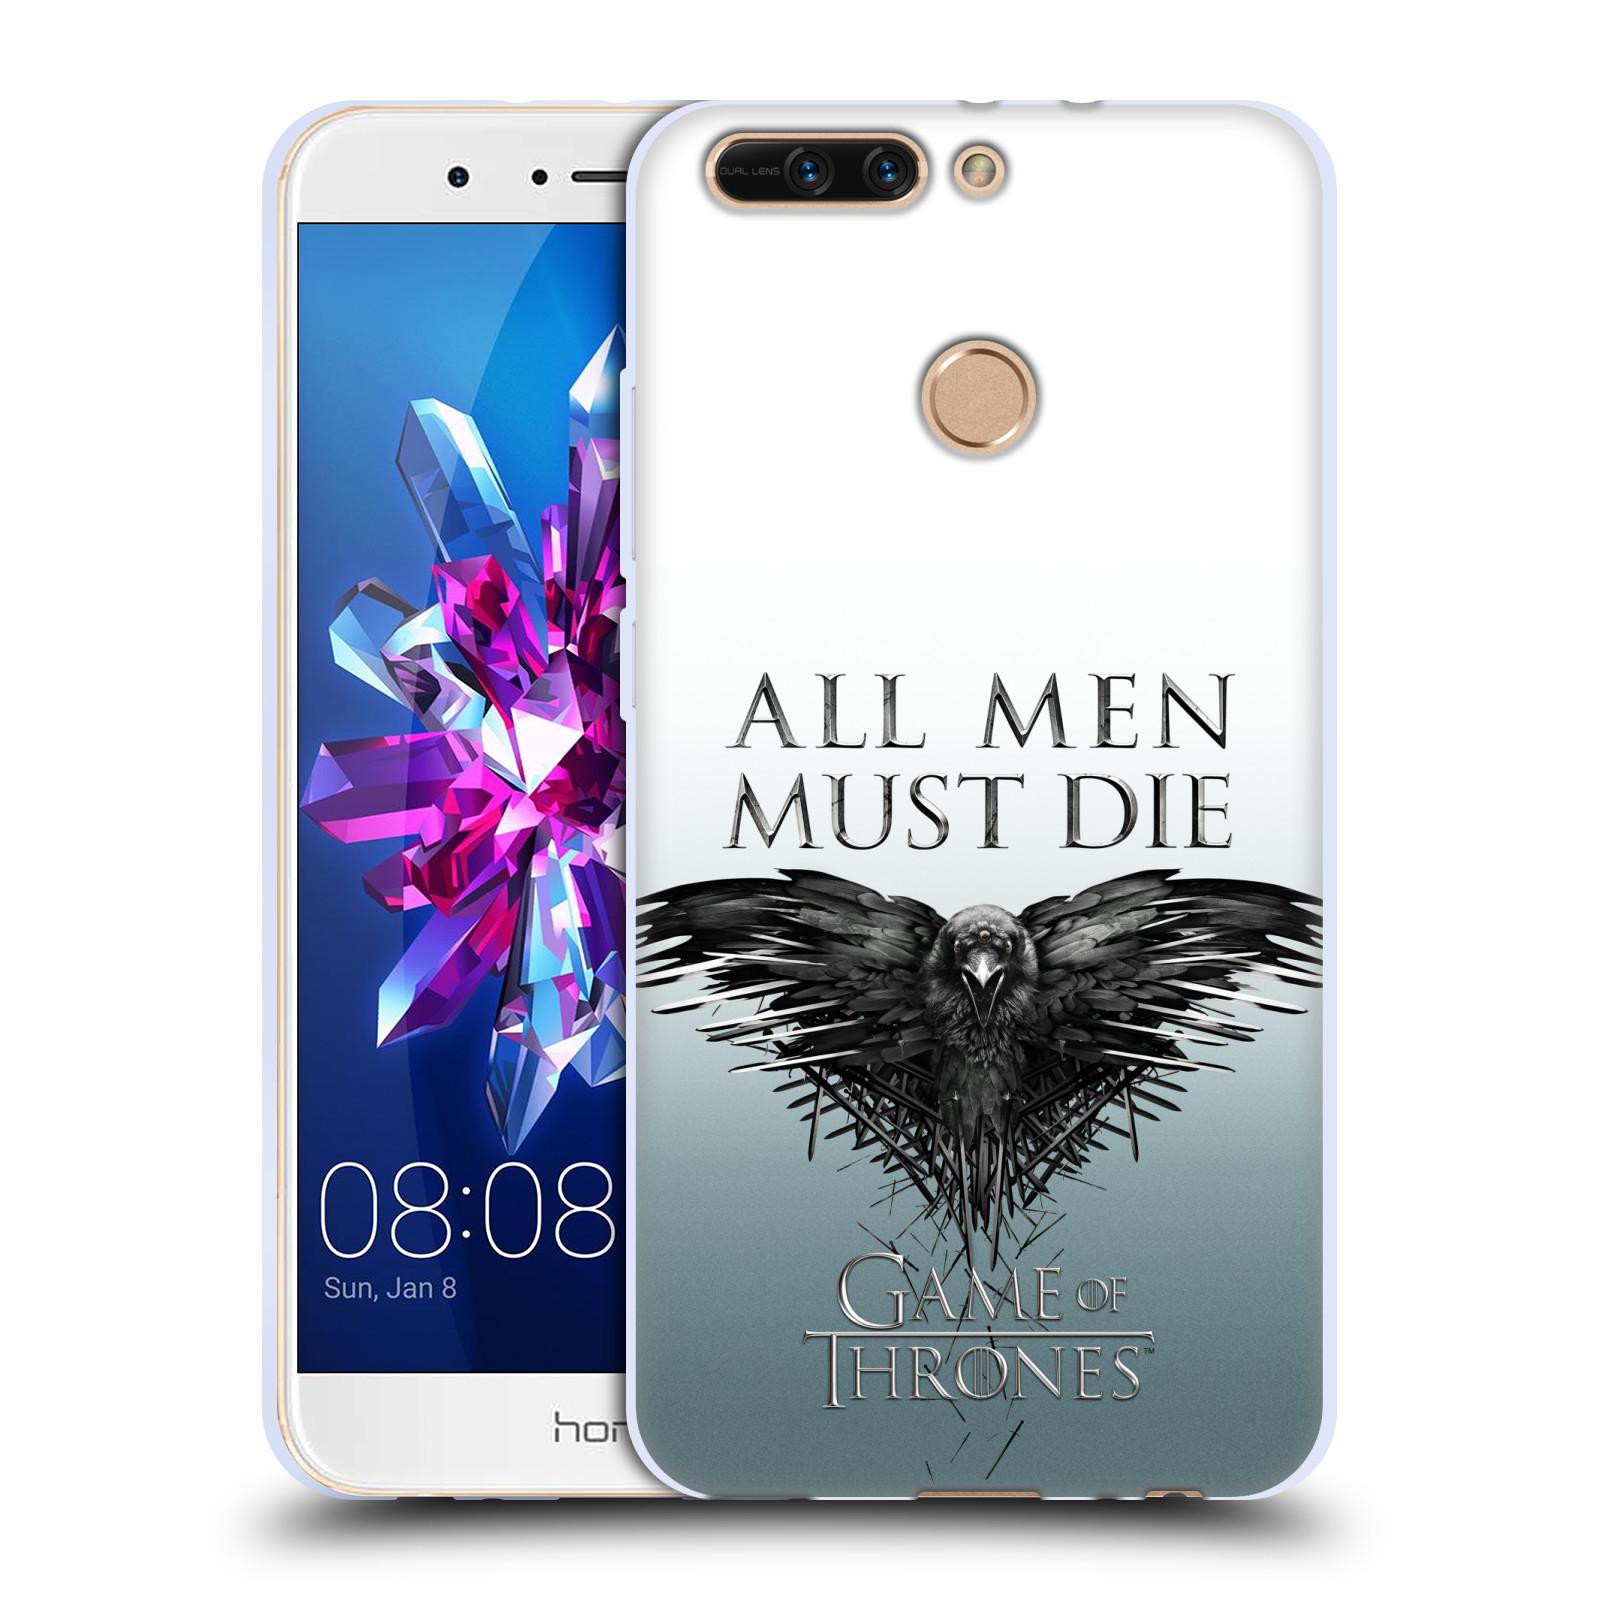 HEAD CASE silikonový obal na mobil Huawei HONOR 8 PRO / Honor 8 PRO DUAL SIM oficiální kryt Hra o trůny havran